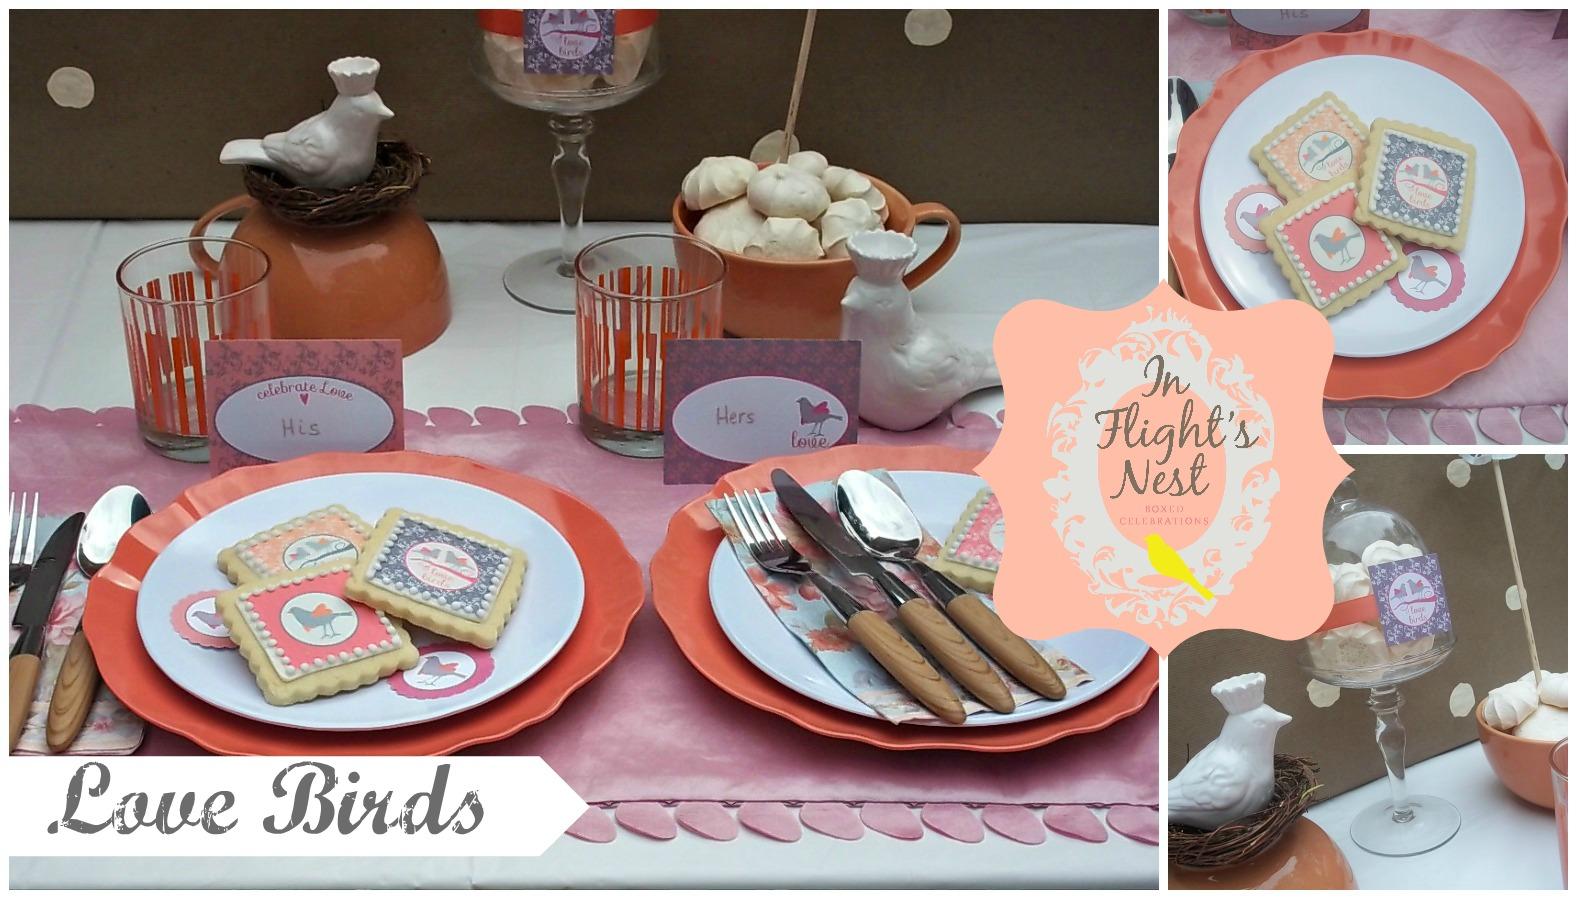 http://2.bp.blogspot.com/-wihI8A4kTts/UFpARIkmwxI/AAAAAAAADeo/HH5LHcyK8Eo/s1600/lovebirdscollage2ed.jpg